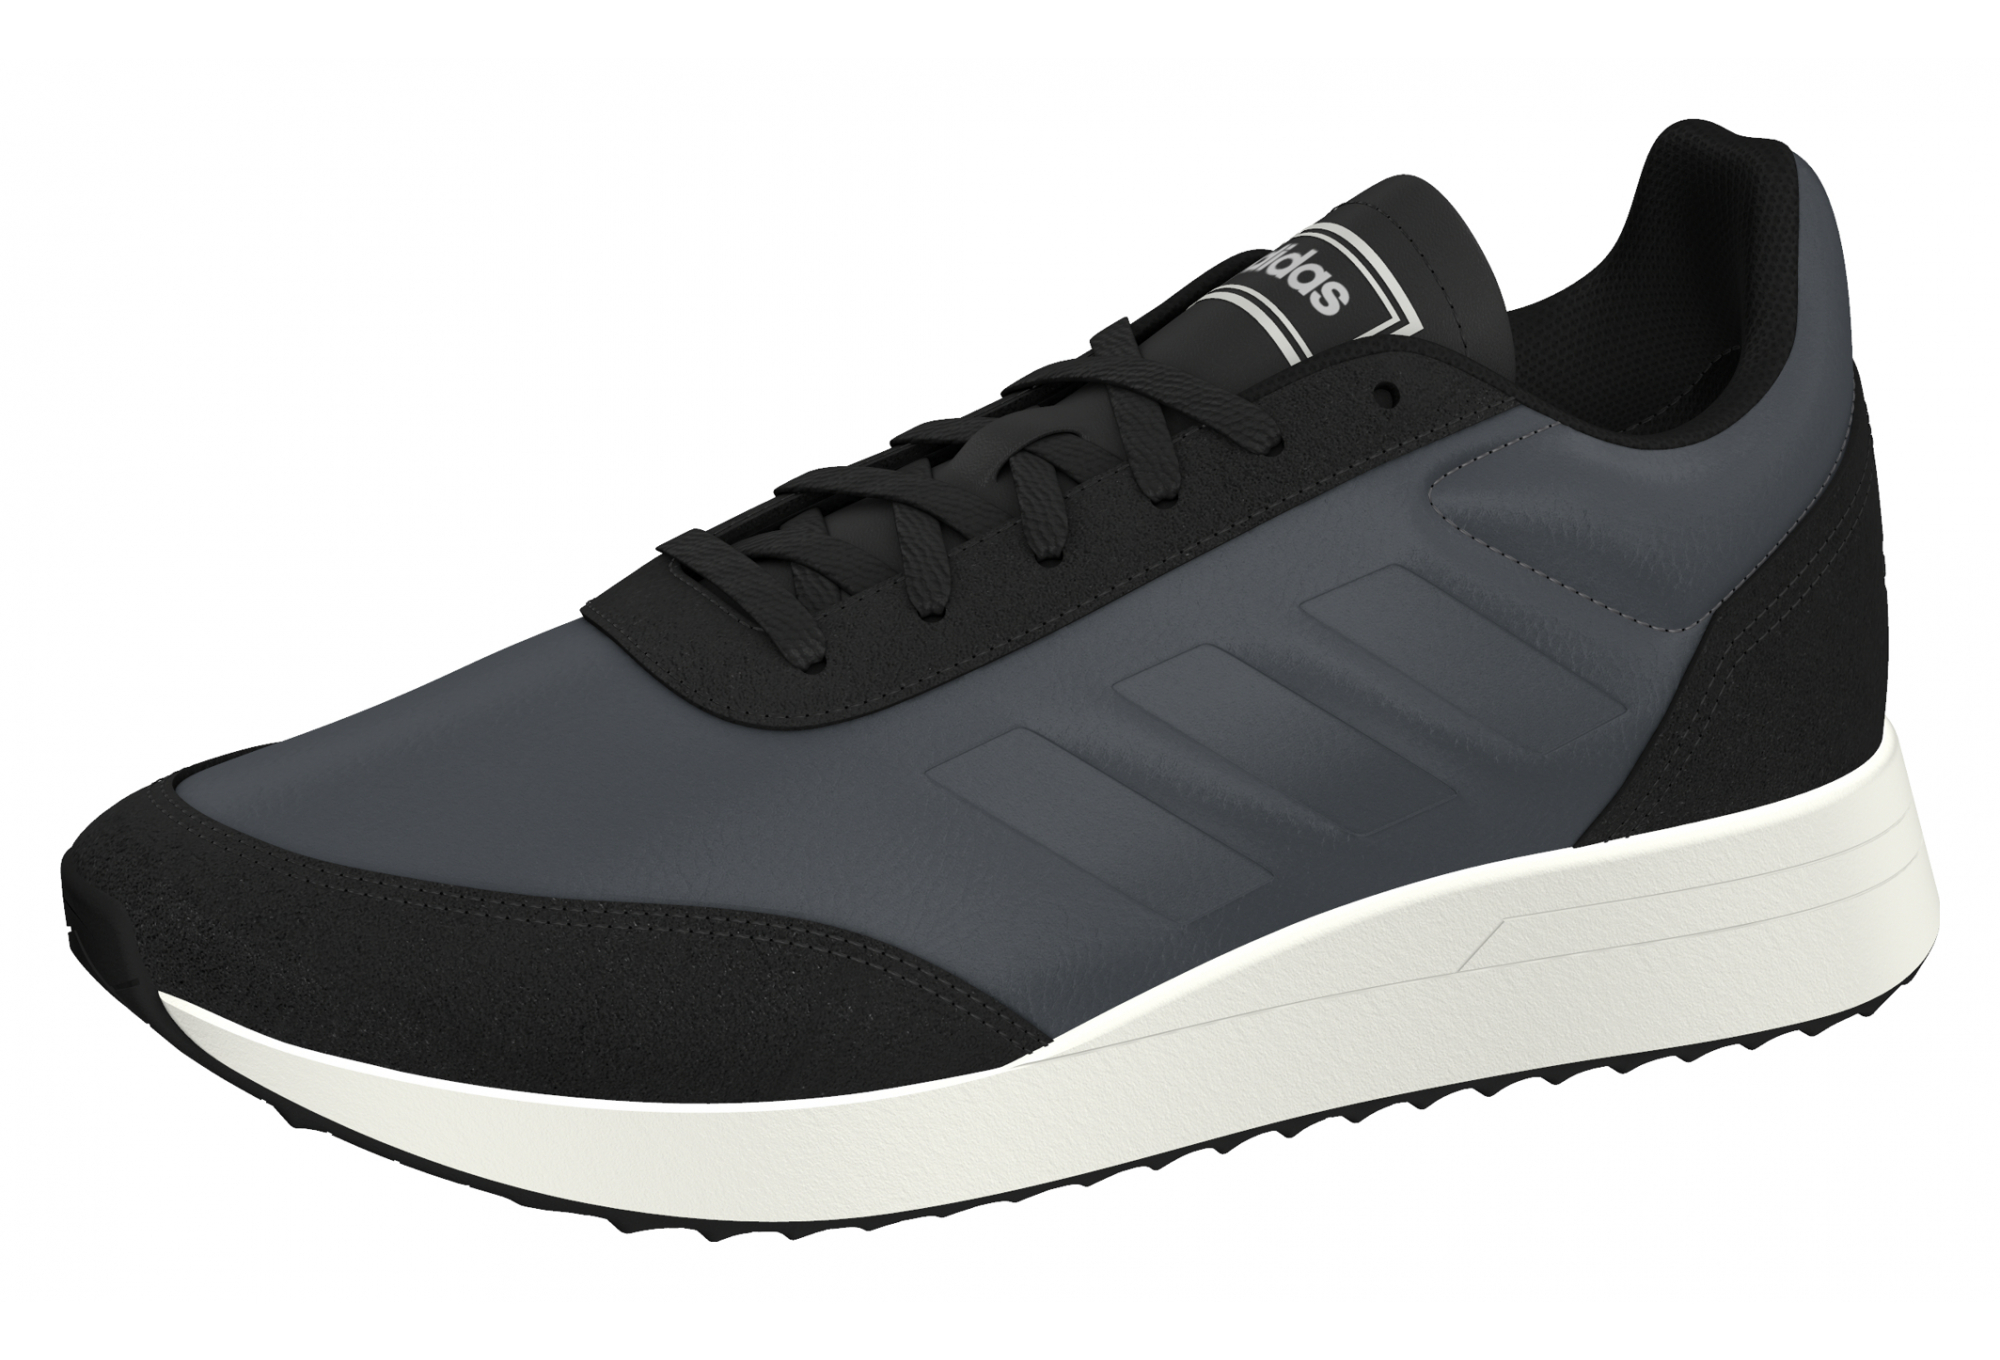 Chaussures femme adidas Run 70s